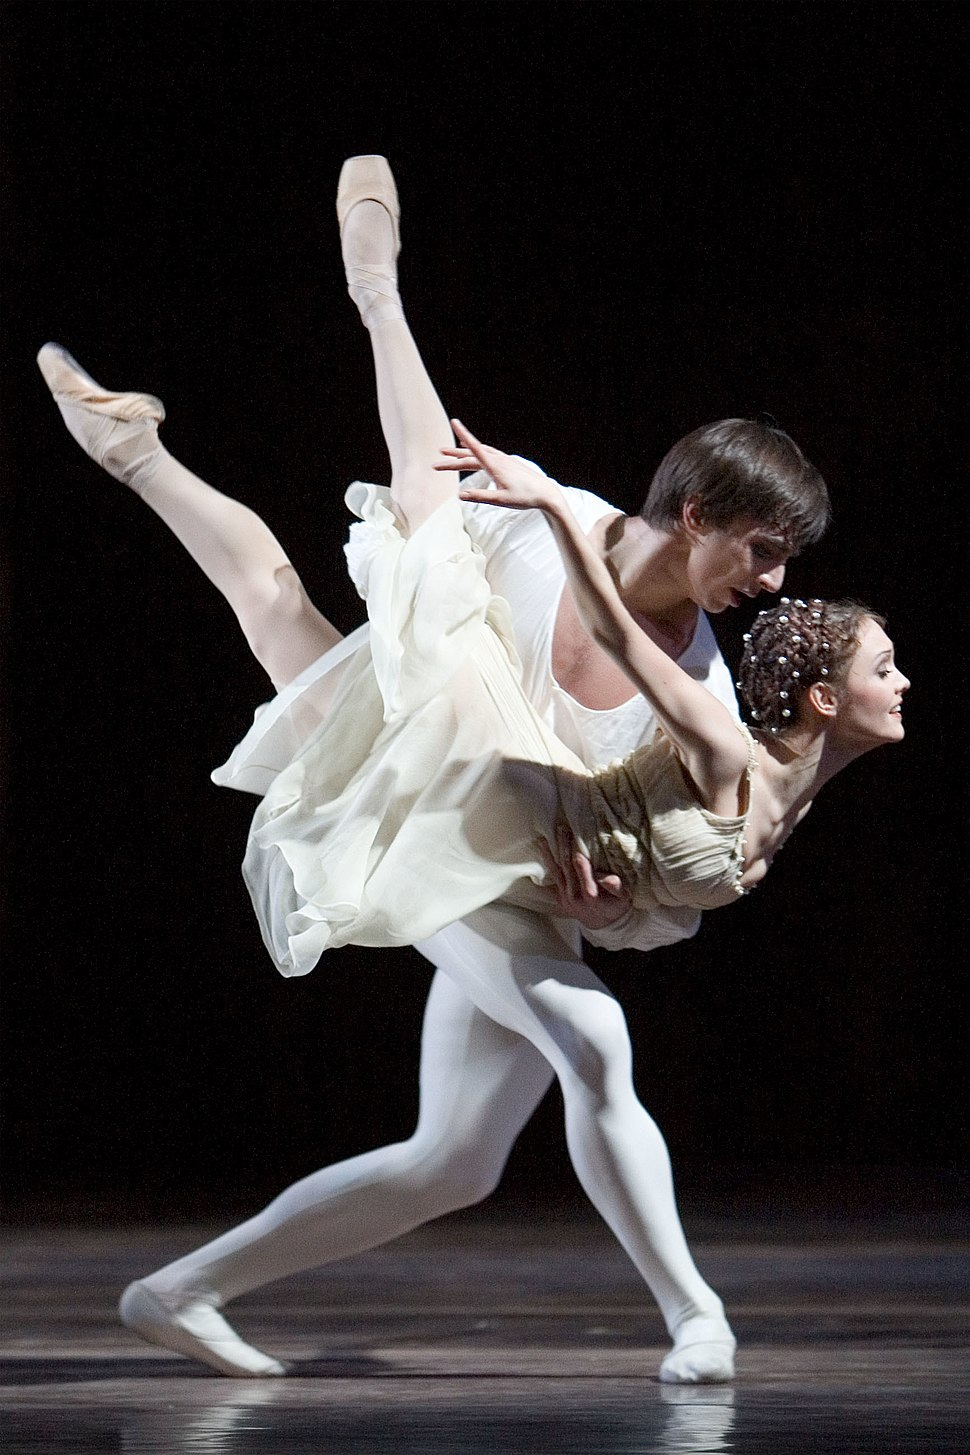 Jurgita Dronina and Olaf Kollmannsperger in Romeo and Juliet 2007